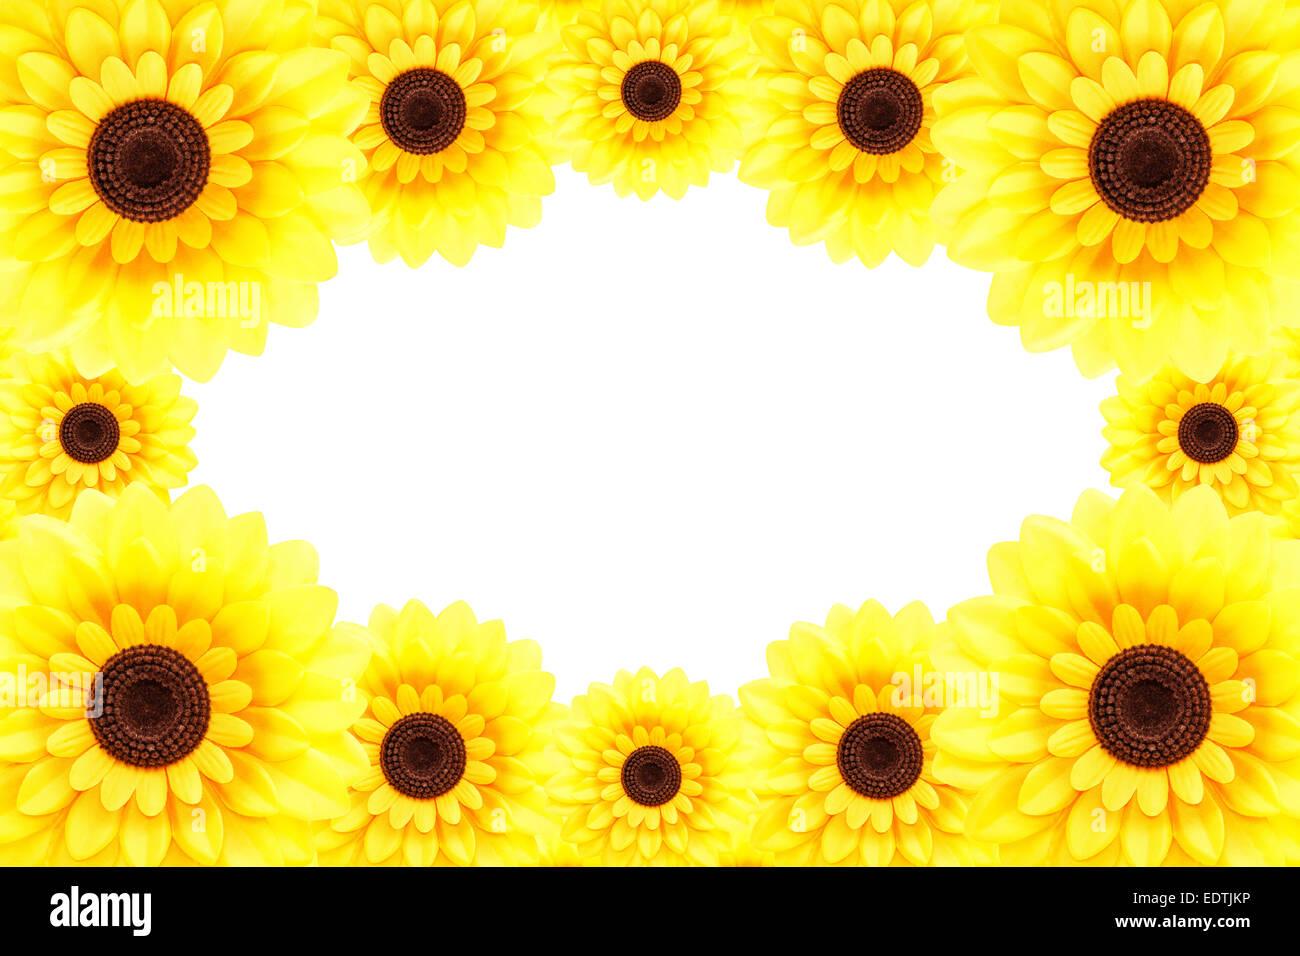 Sunflower frame Stock Photo: 77373514 - Alamy